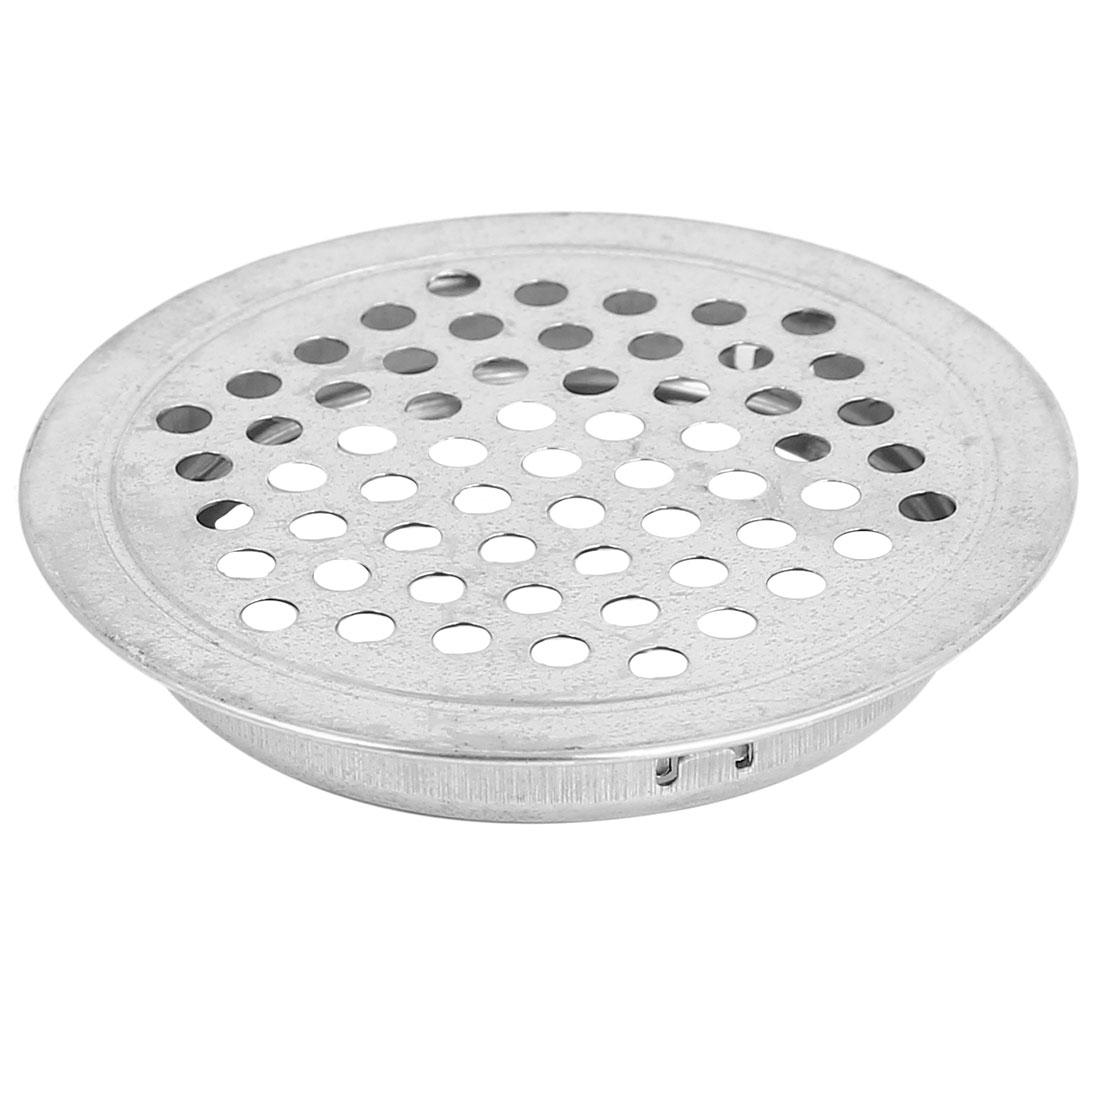 65mm Dia Home Kitchen Bathroom Floor Sink Basin Drain Strainer Silver Tone